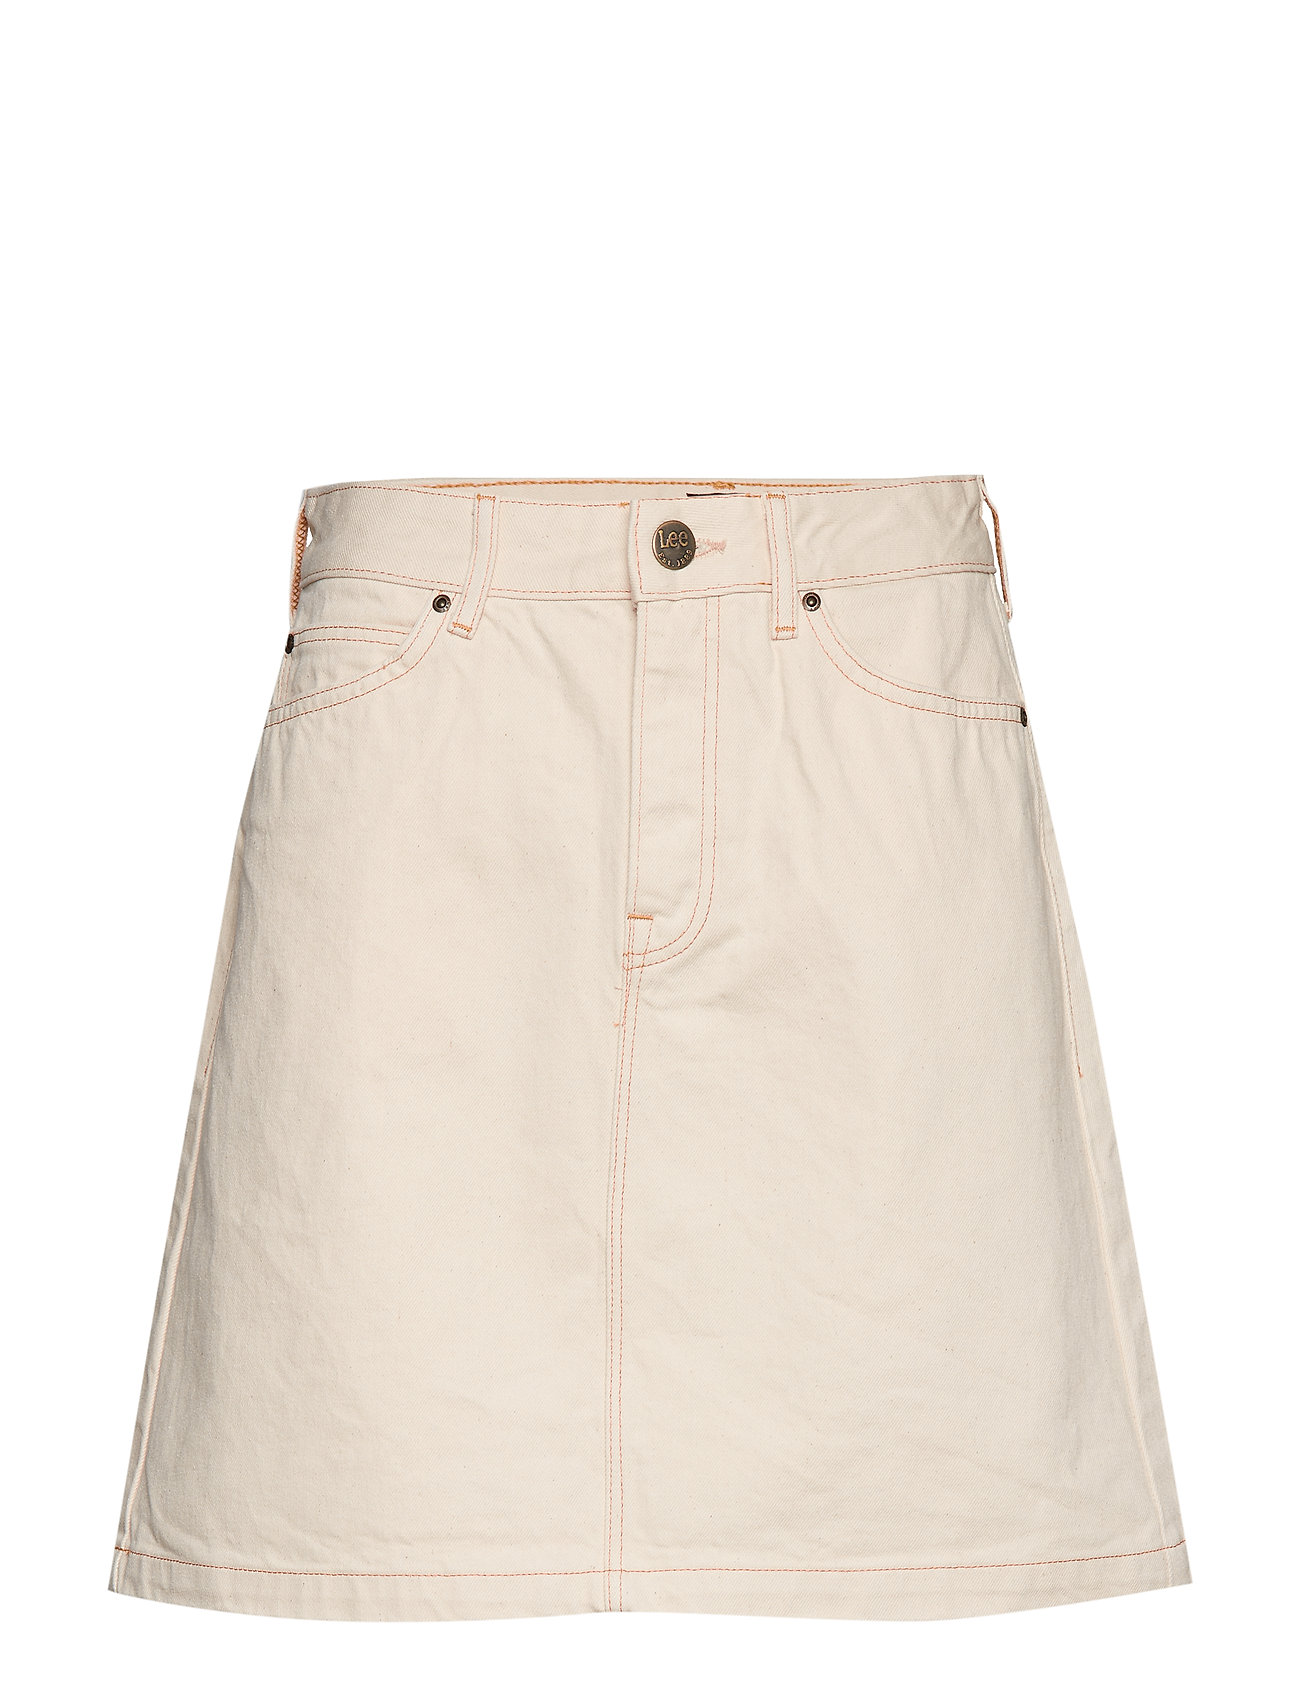 Lee Jeans SEASONAL SKIRT - OFF WHITE